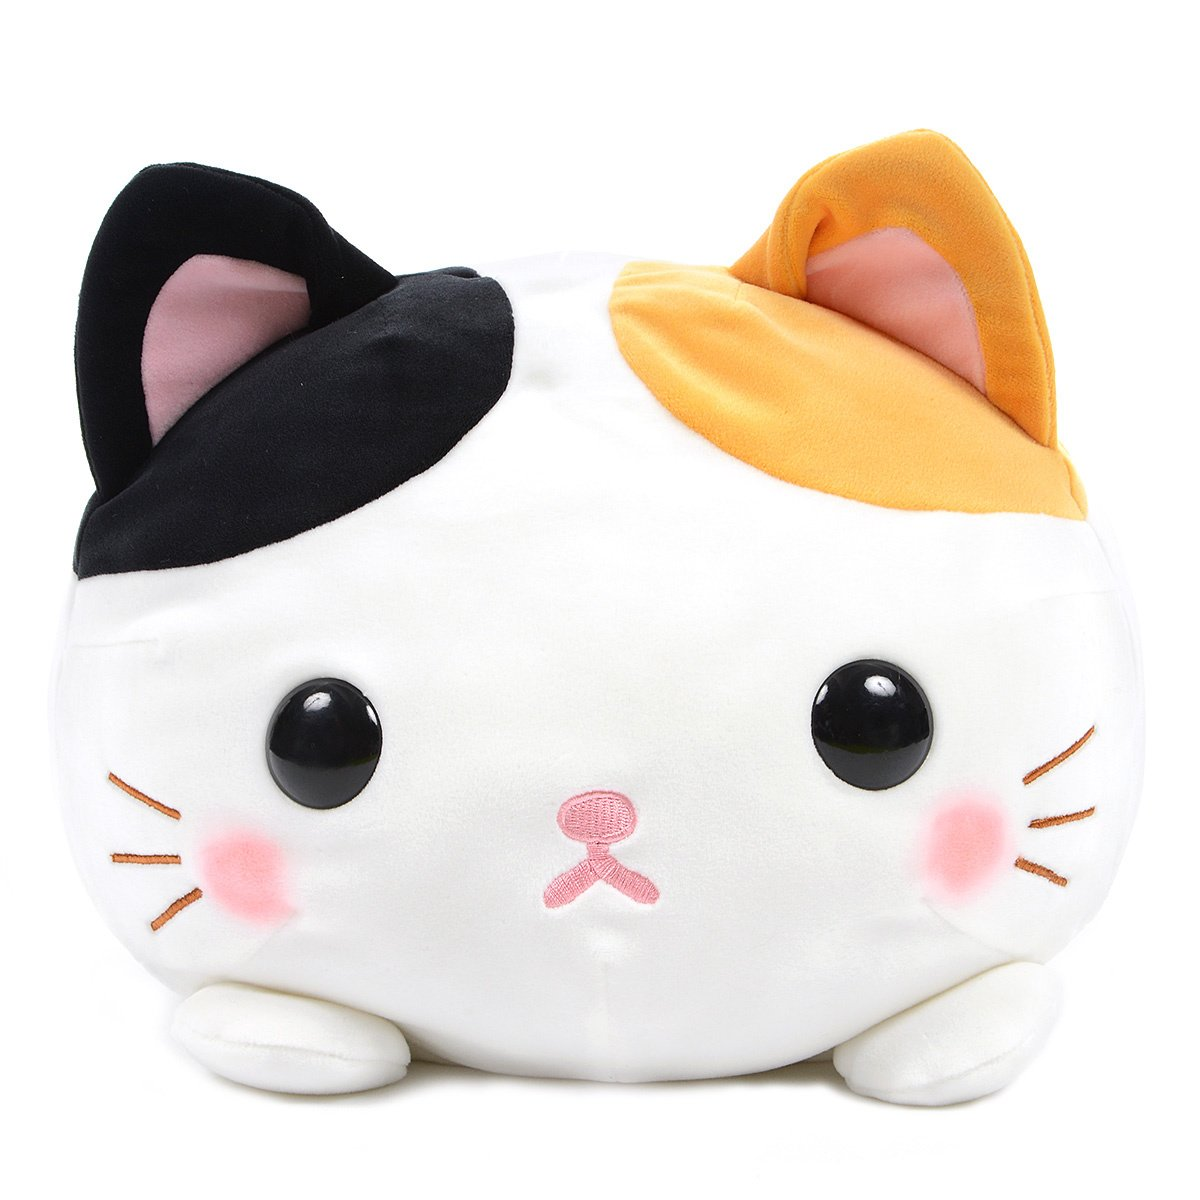 Mochikko Neko Nyanzu White Mix Cat Plush Amuse Super Soft Japan BIG Size Mi-nyan 15 Inches